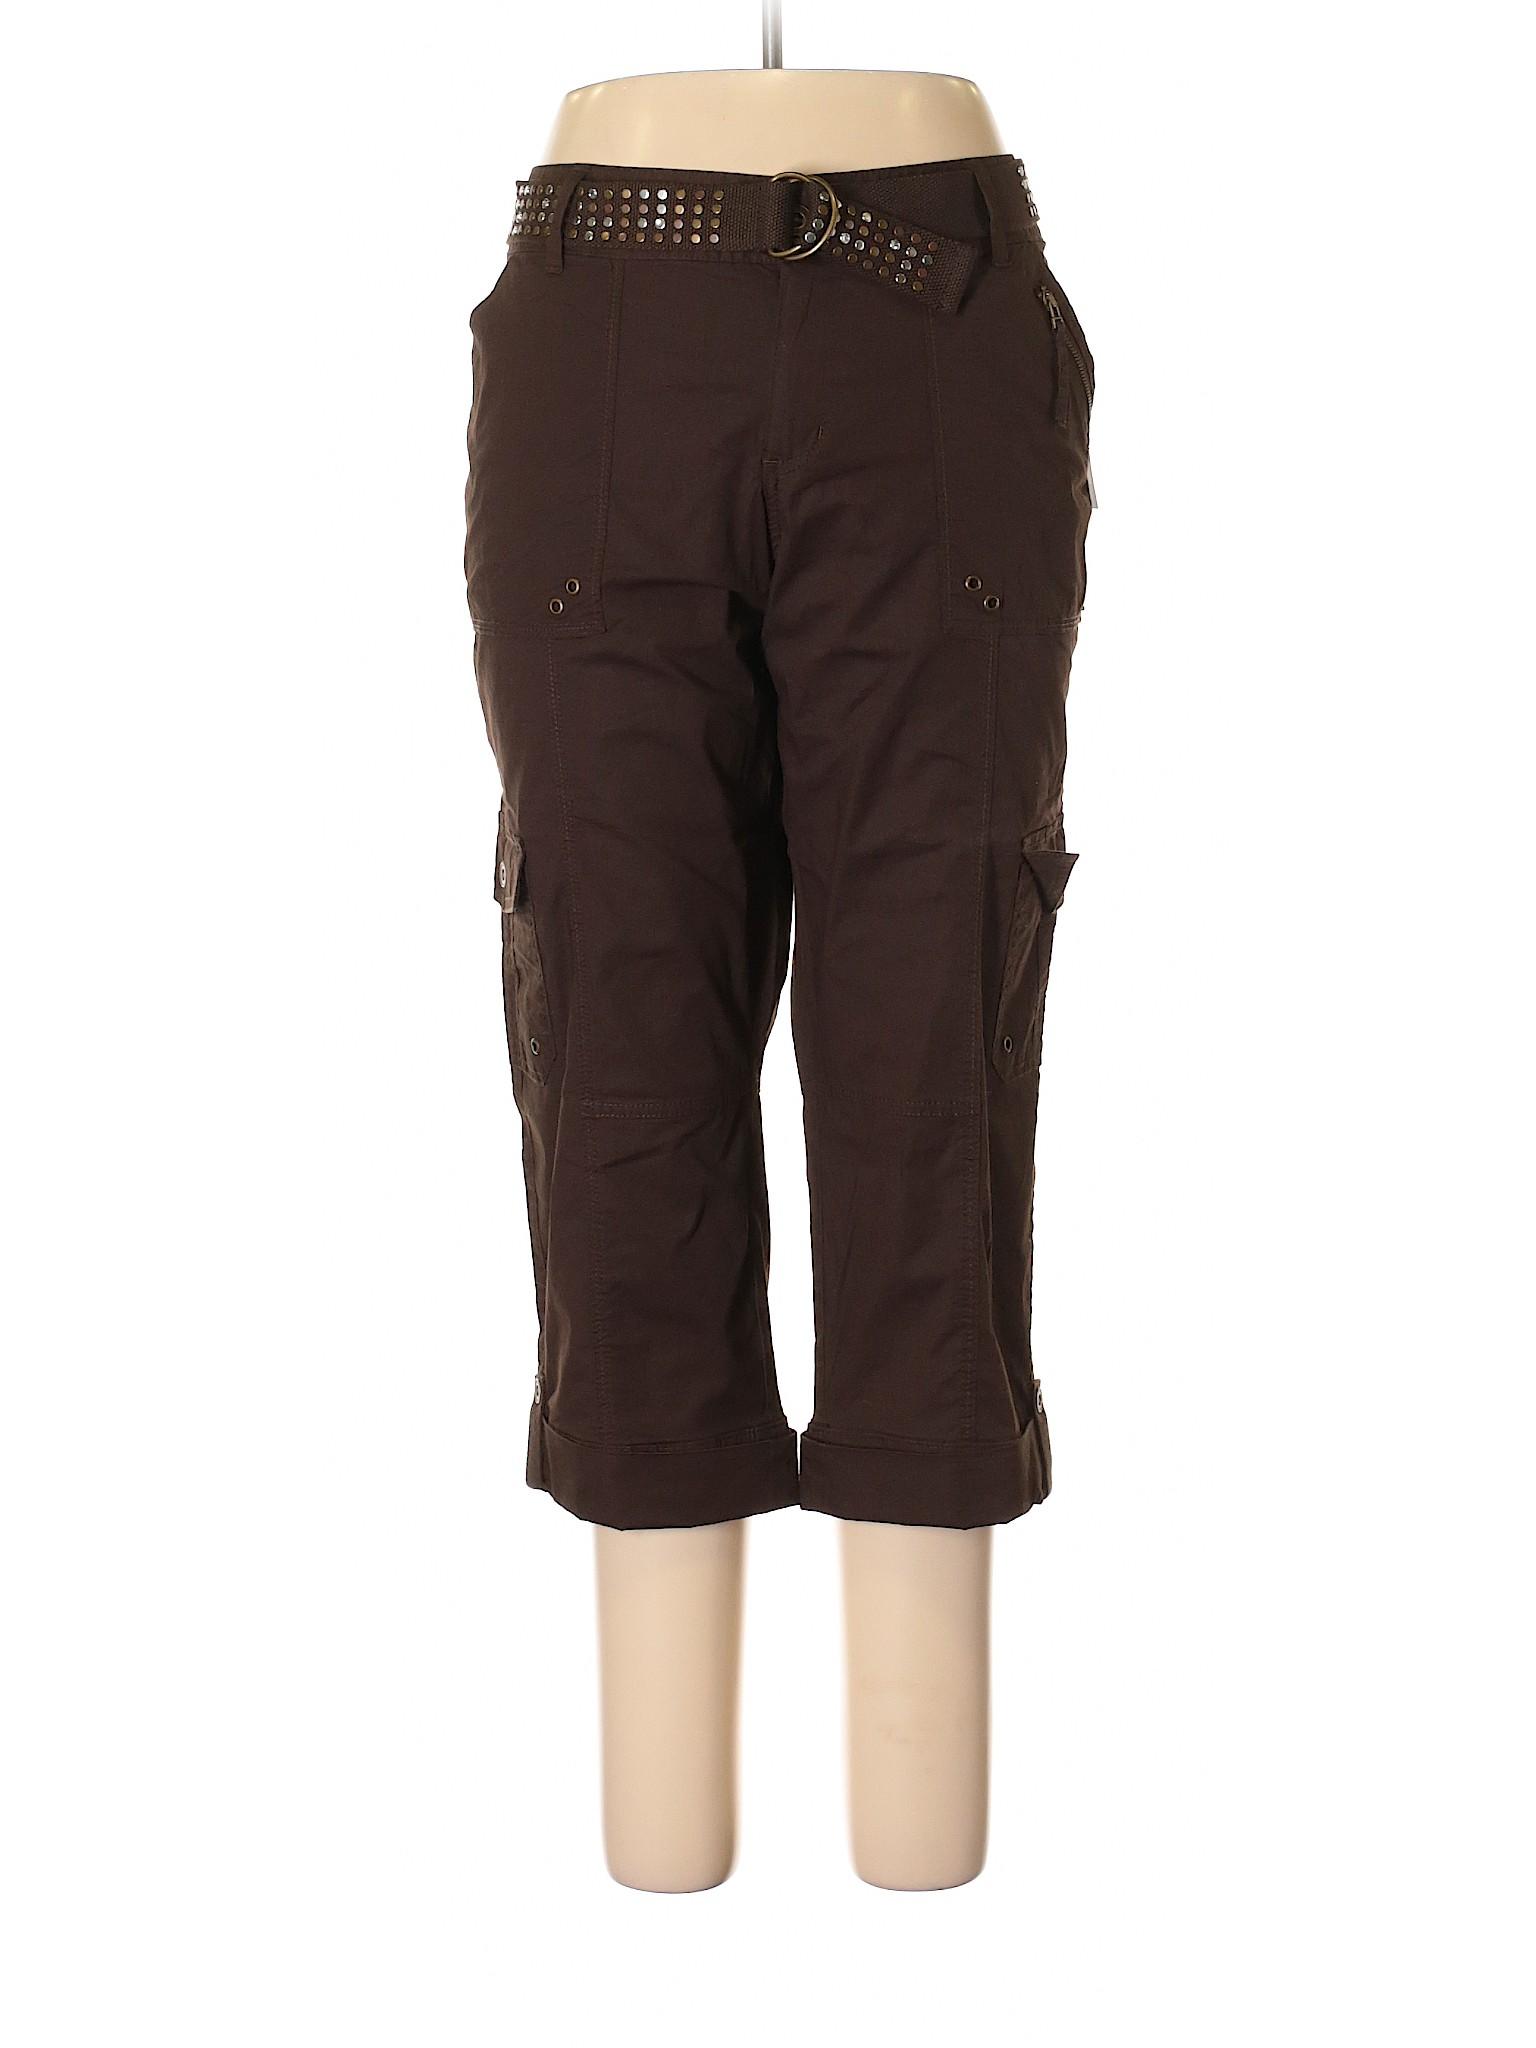 9 Pants Cargo Apt winter Leisure p7q8SS